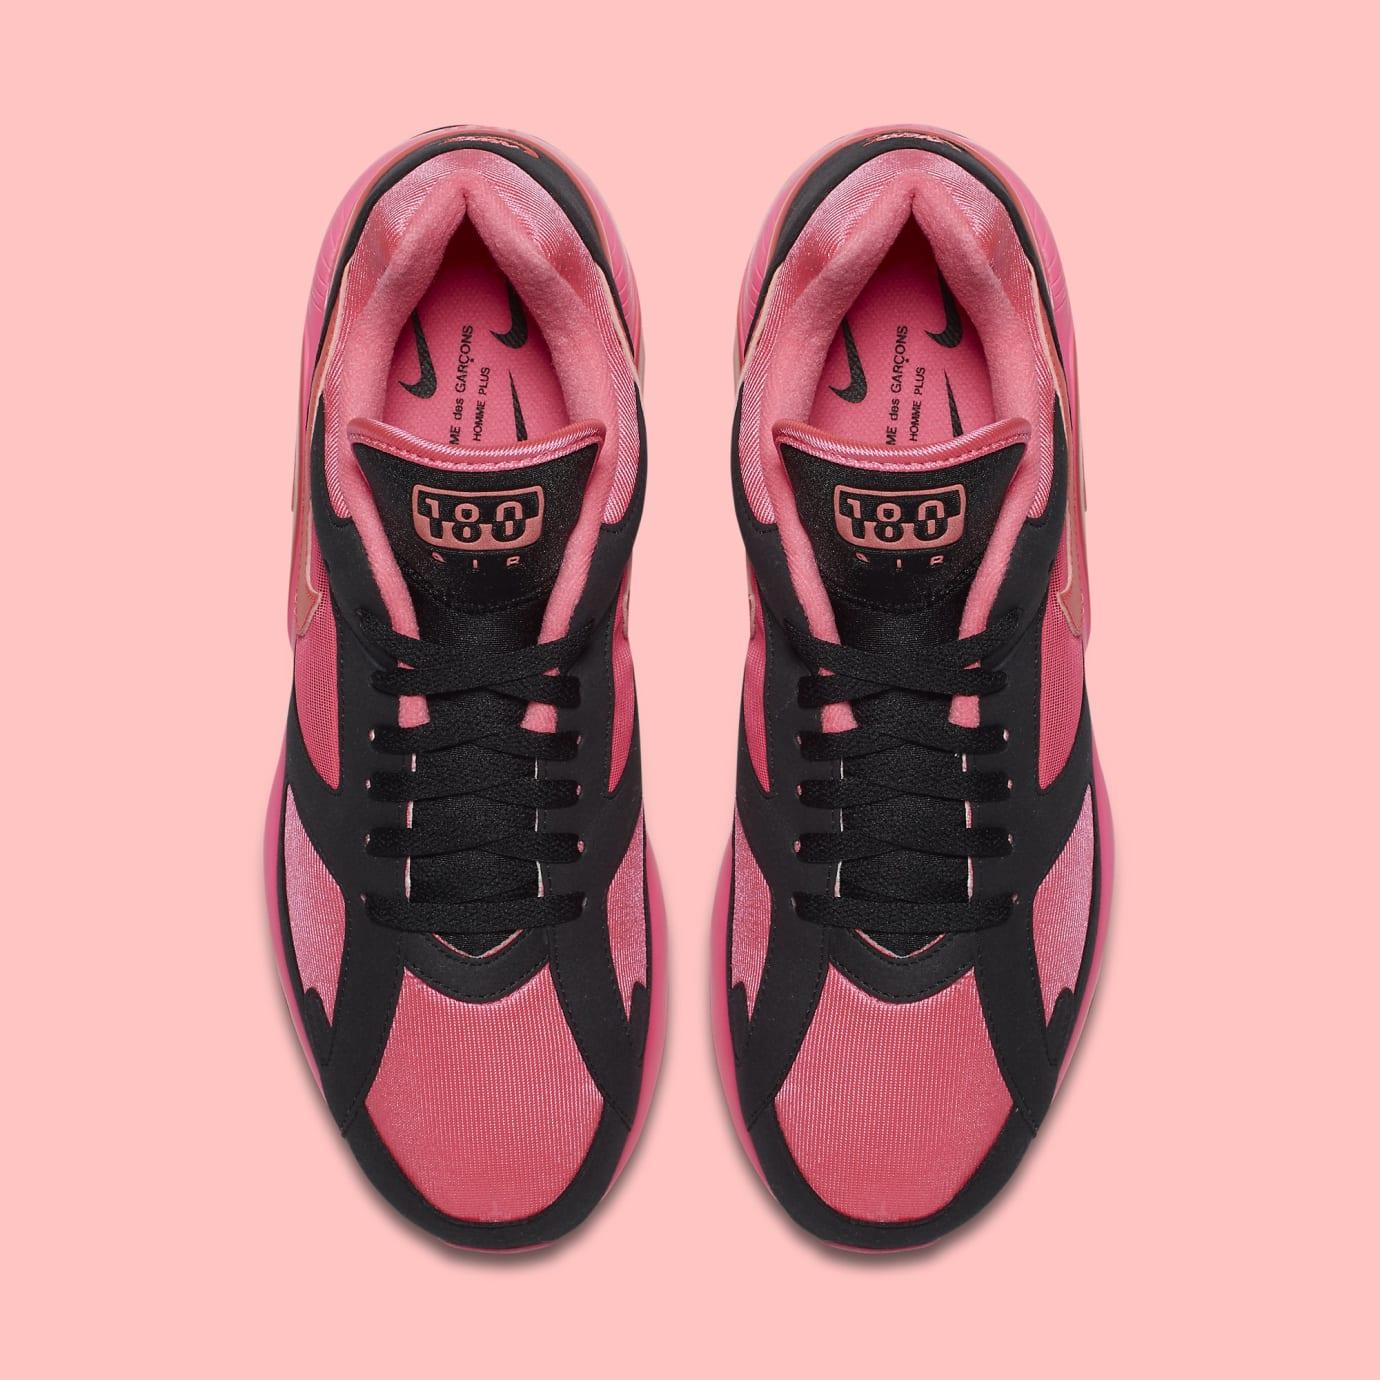 Comme des Garçons x Nike Air Max 180 'Black' AO4641-601 (Top)